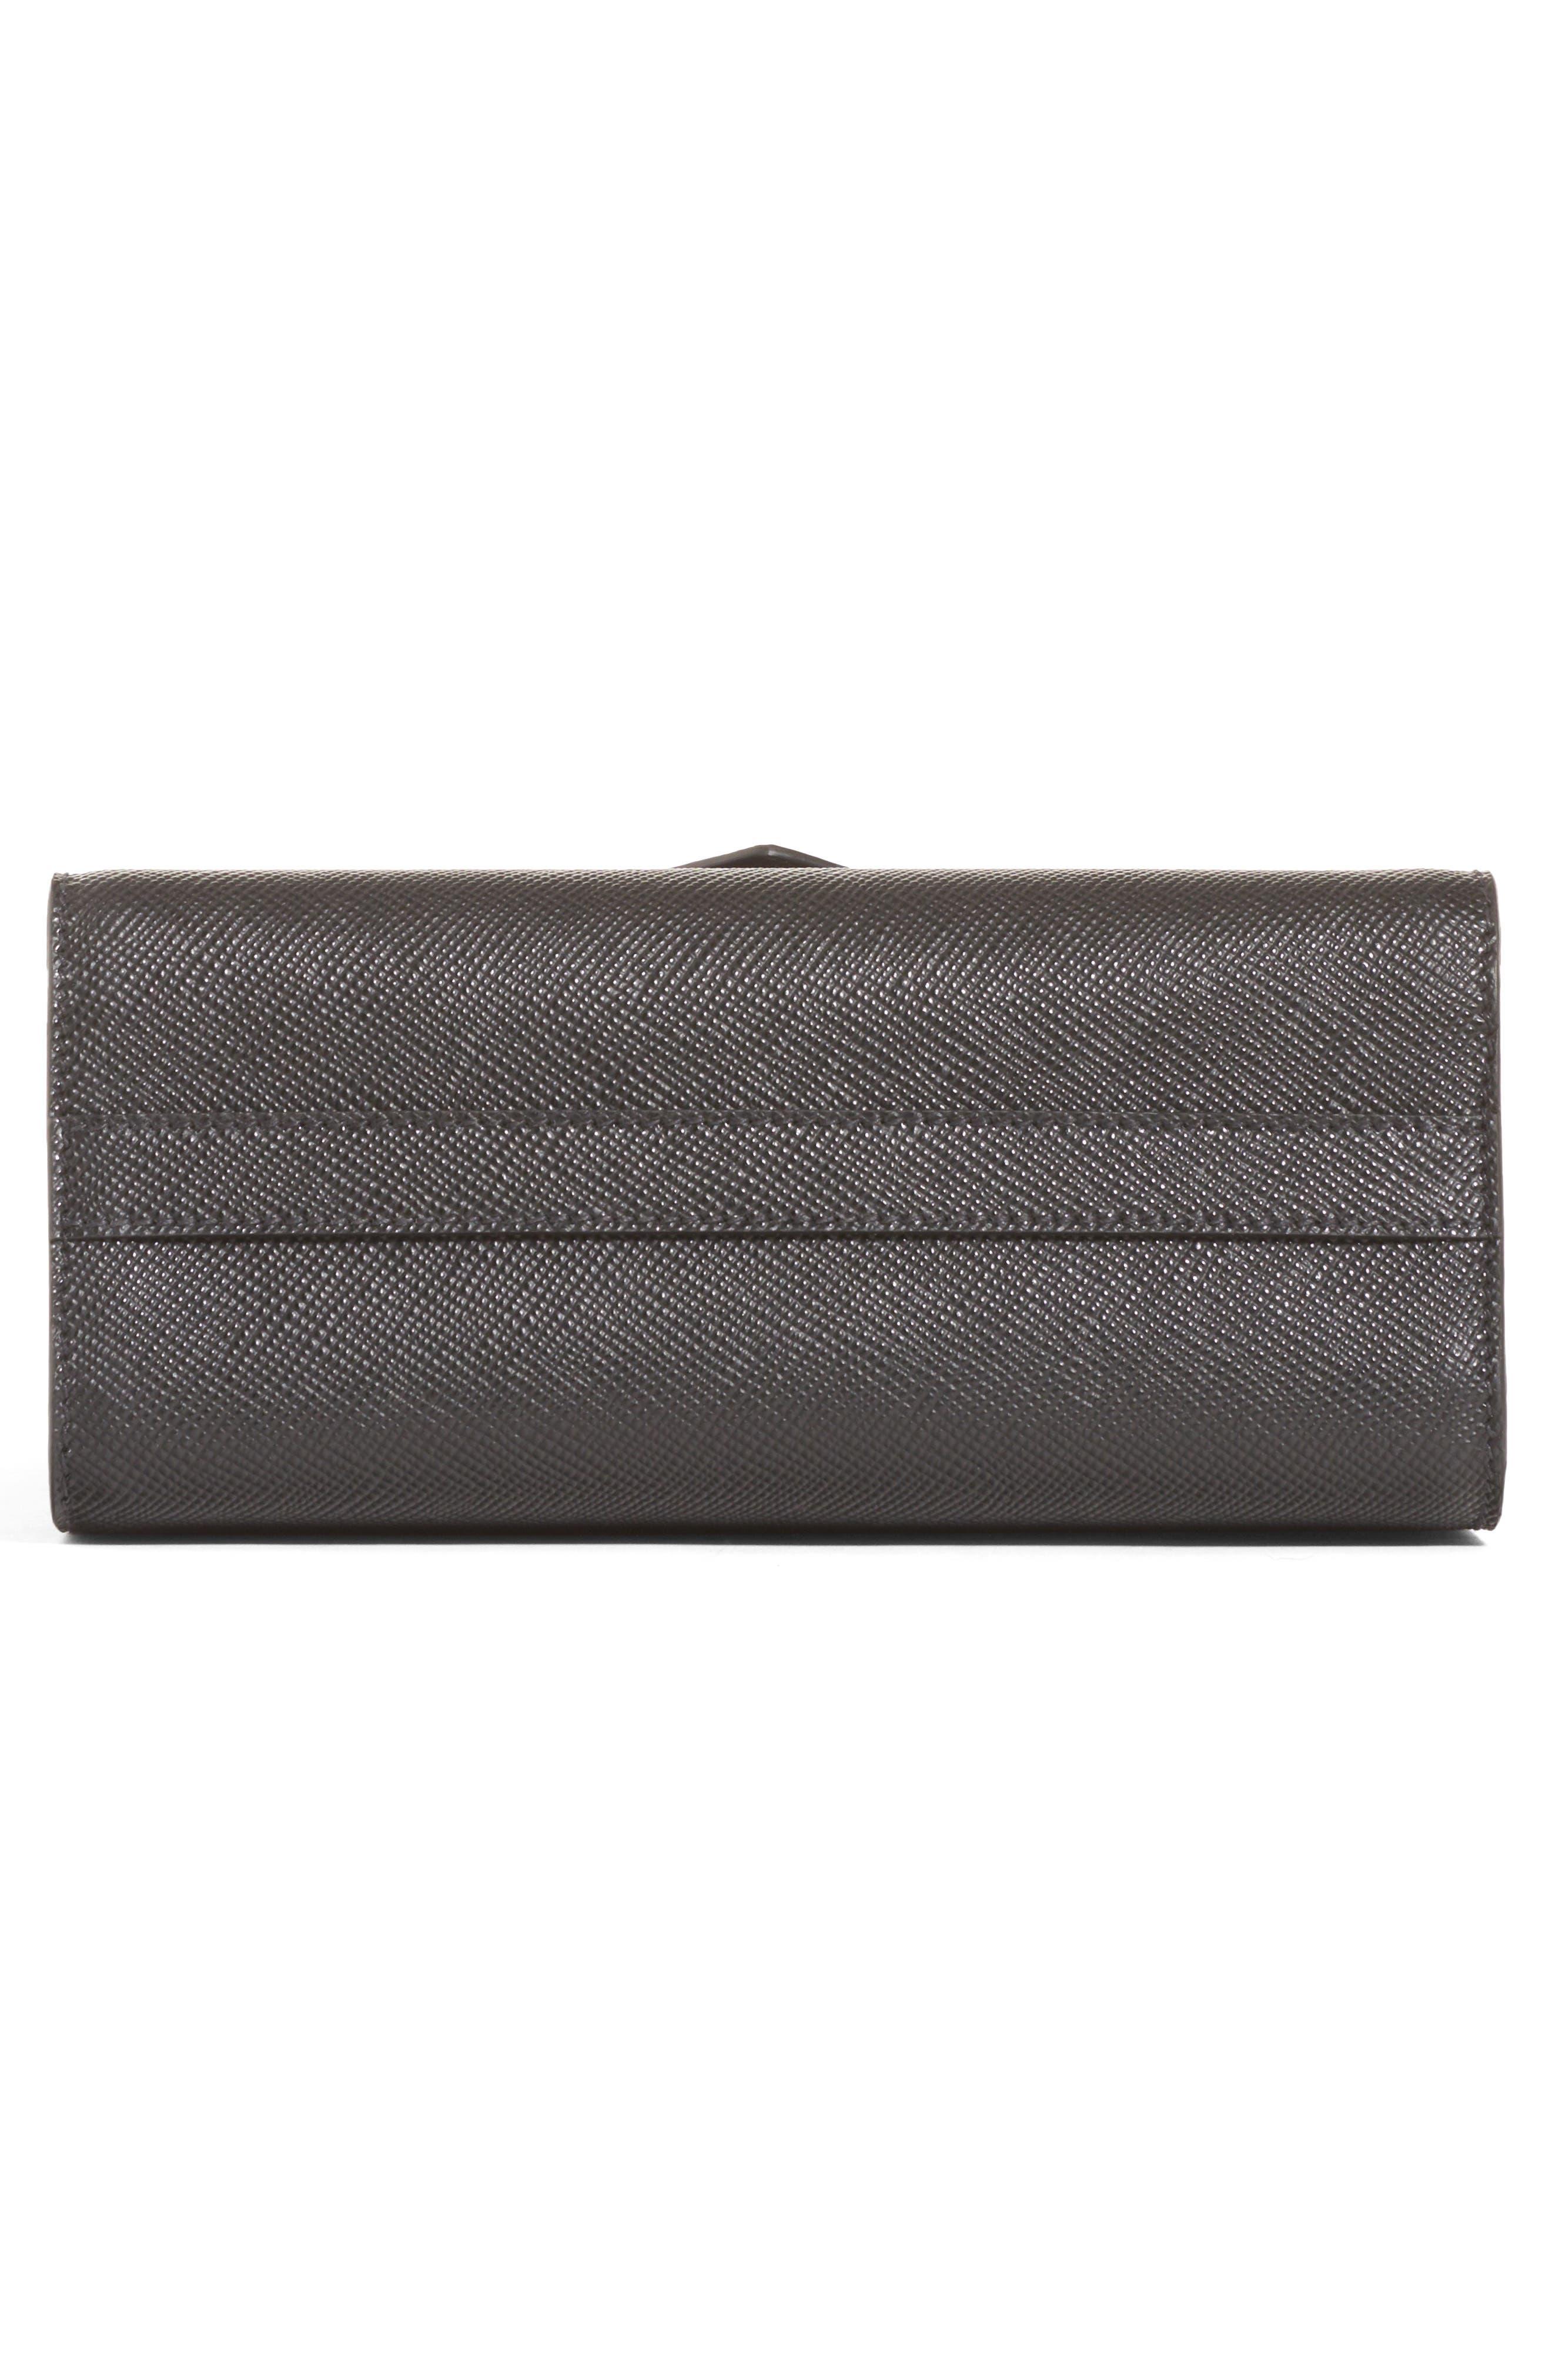 PRADA,                             Monochrome Saffiano Leather Shoulder Bag,                             Alternate thumbnail 5, color,                             NERO